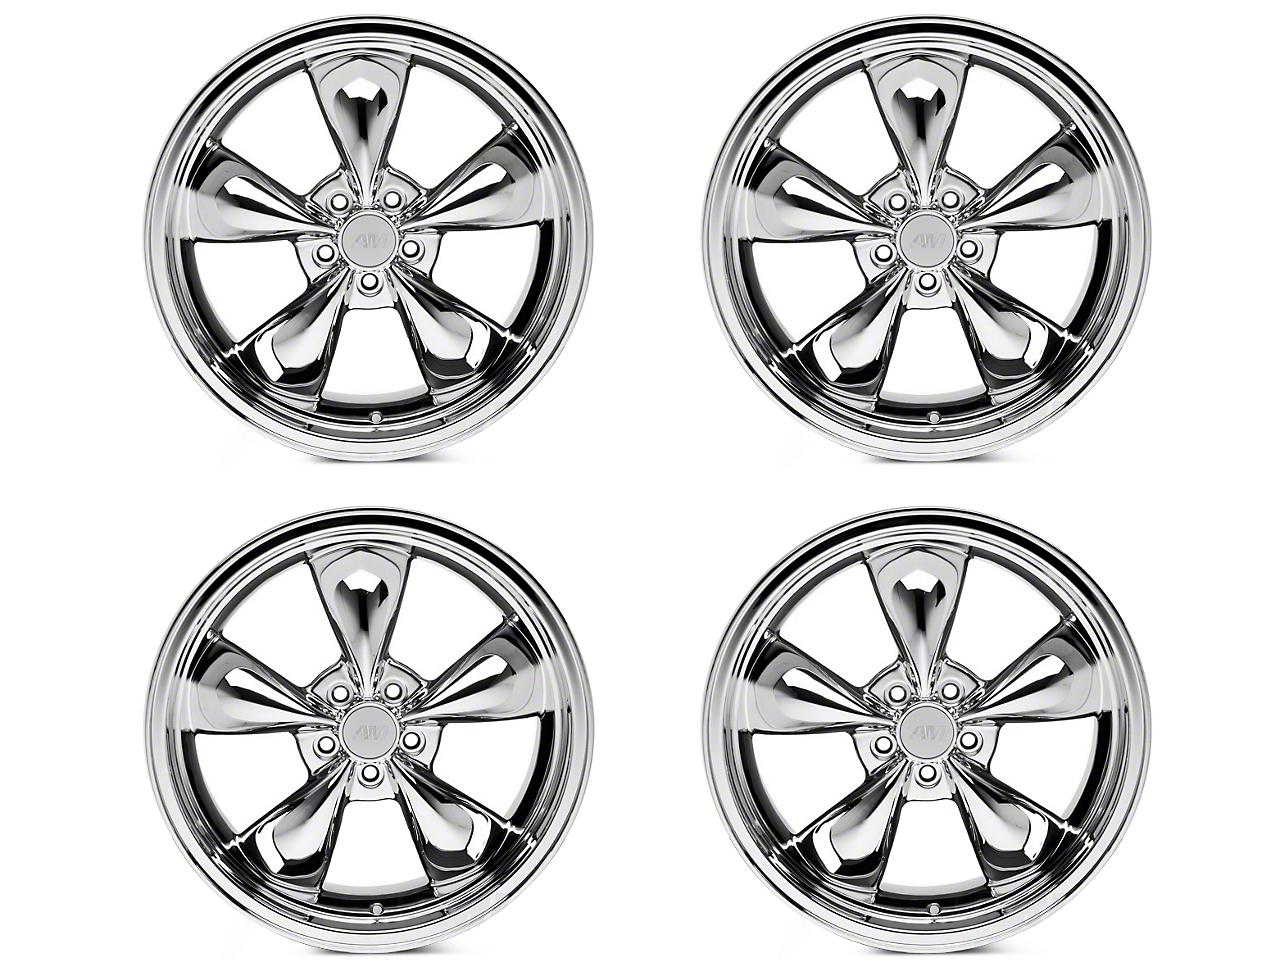 Deep Dish Bullitt Chrome 4 Wheel Kit - 20x8.5 (05-14 V6; 05-10 GT)